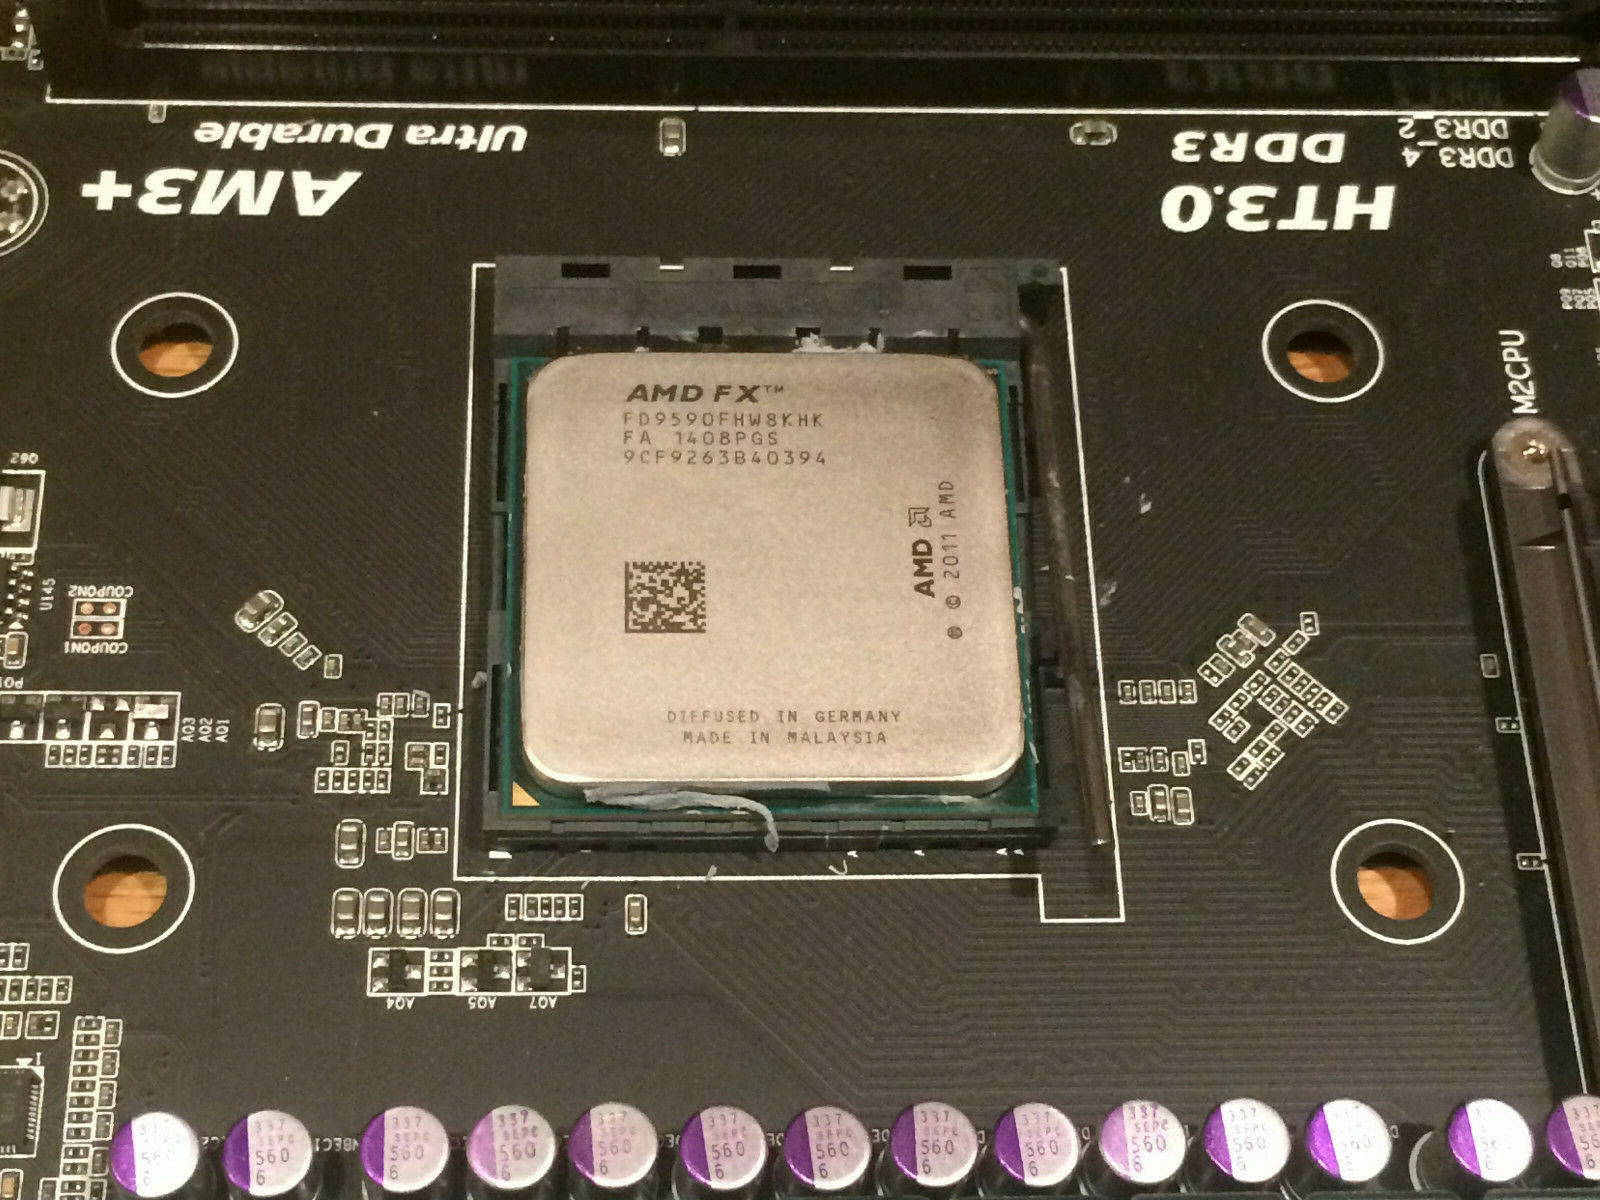 AMD FX 9590 W/ Gigabyte GA-990FXA-UD3 Motherboard Both Used Working  - $225.00